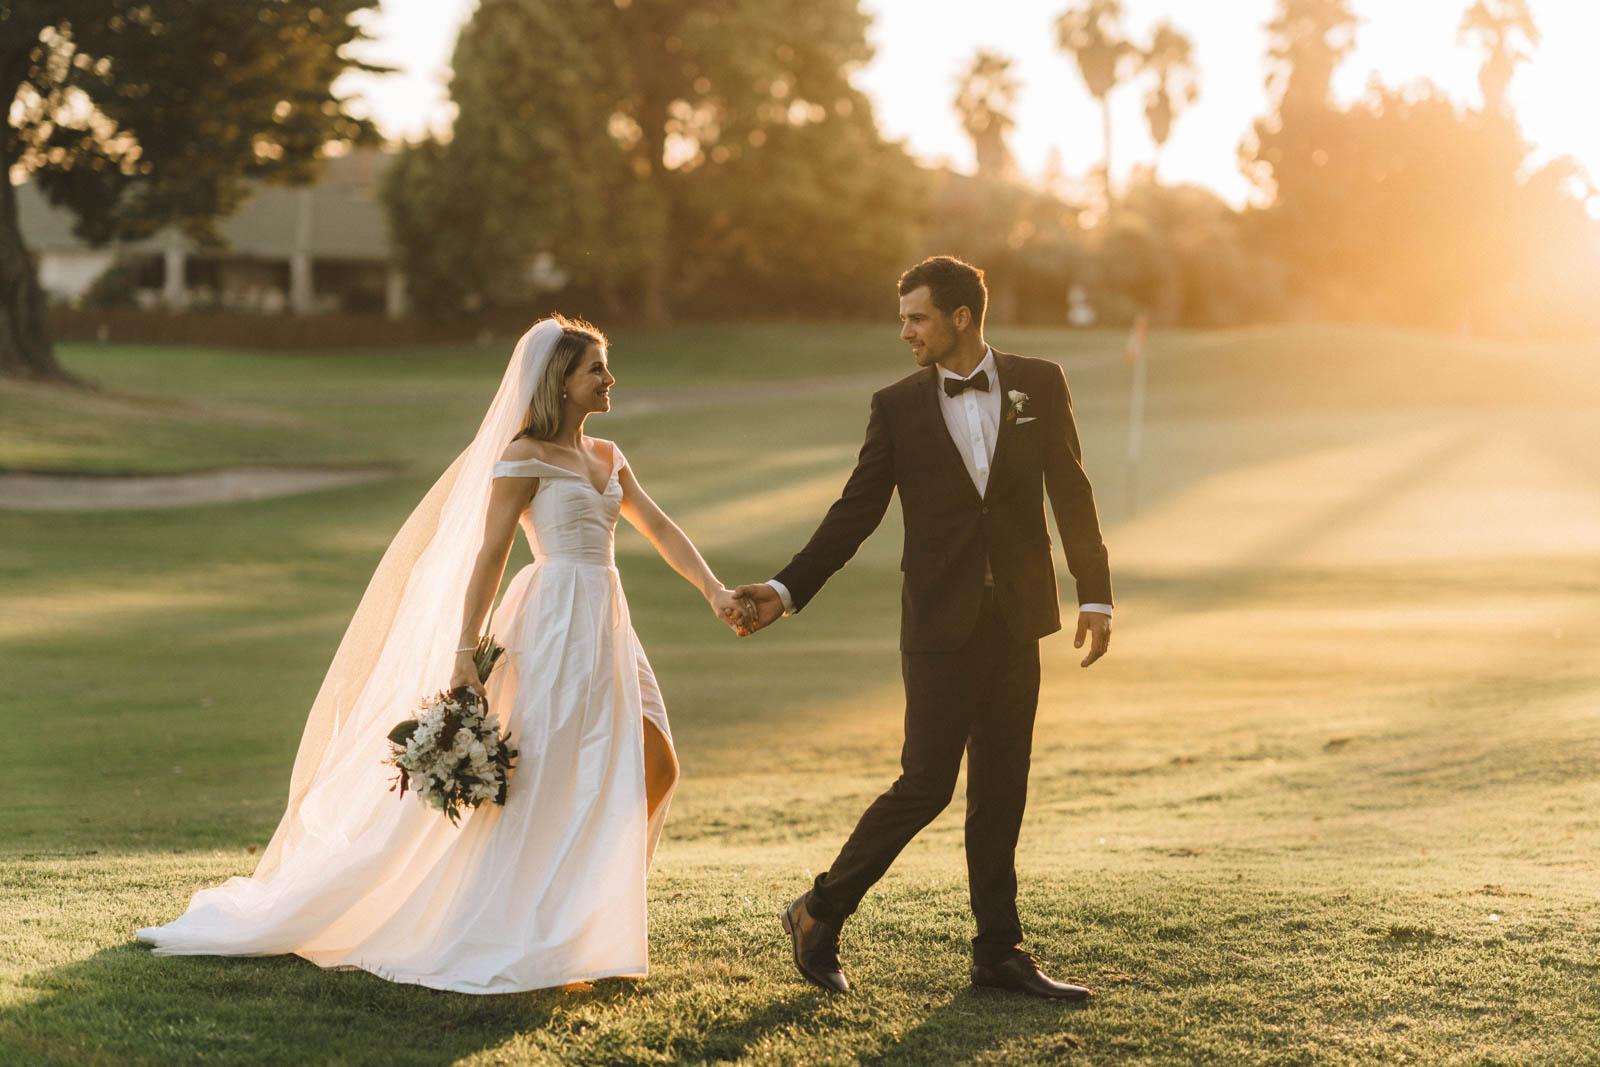 newfound-s-p-mt-maunganui-tauranga-wedding-photographer-1805-A9_07611